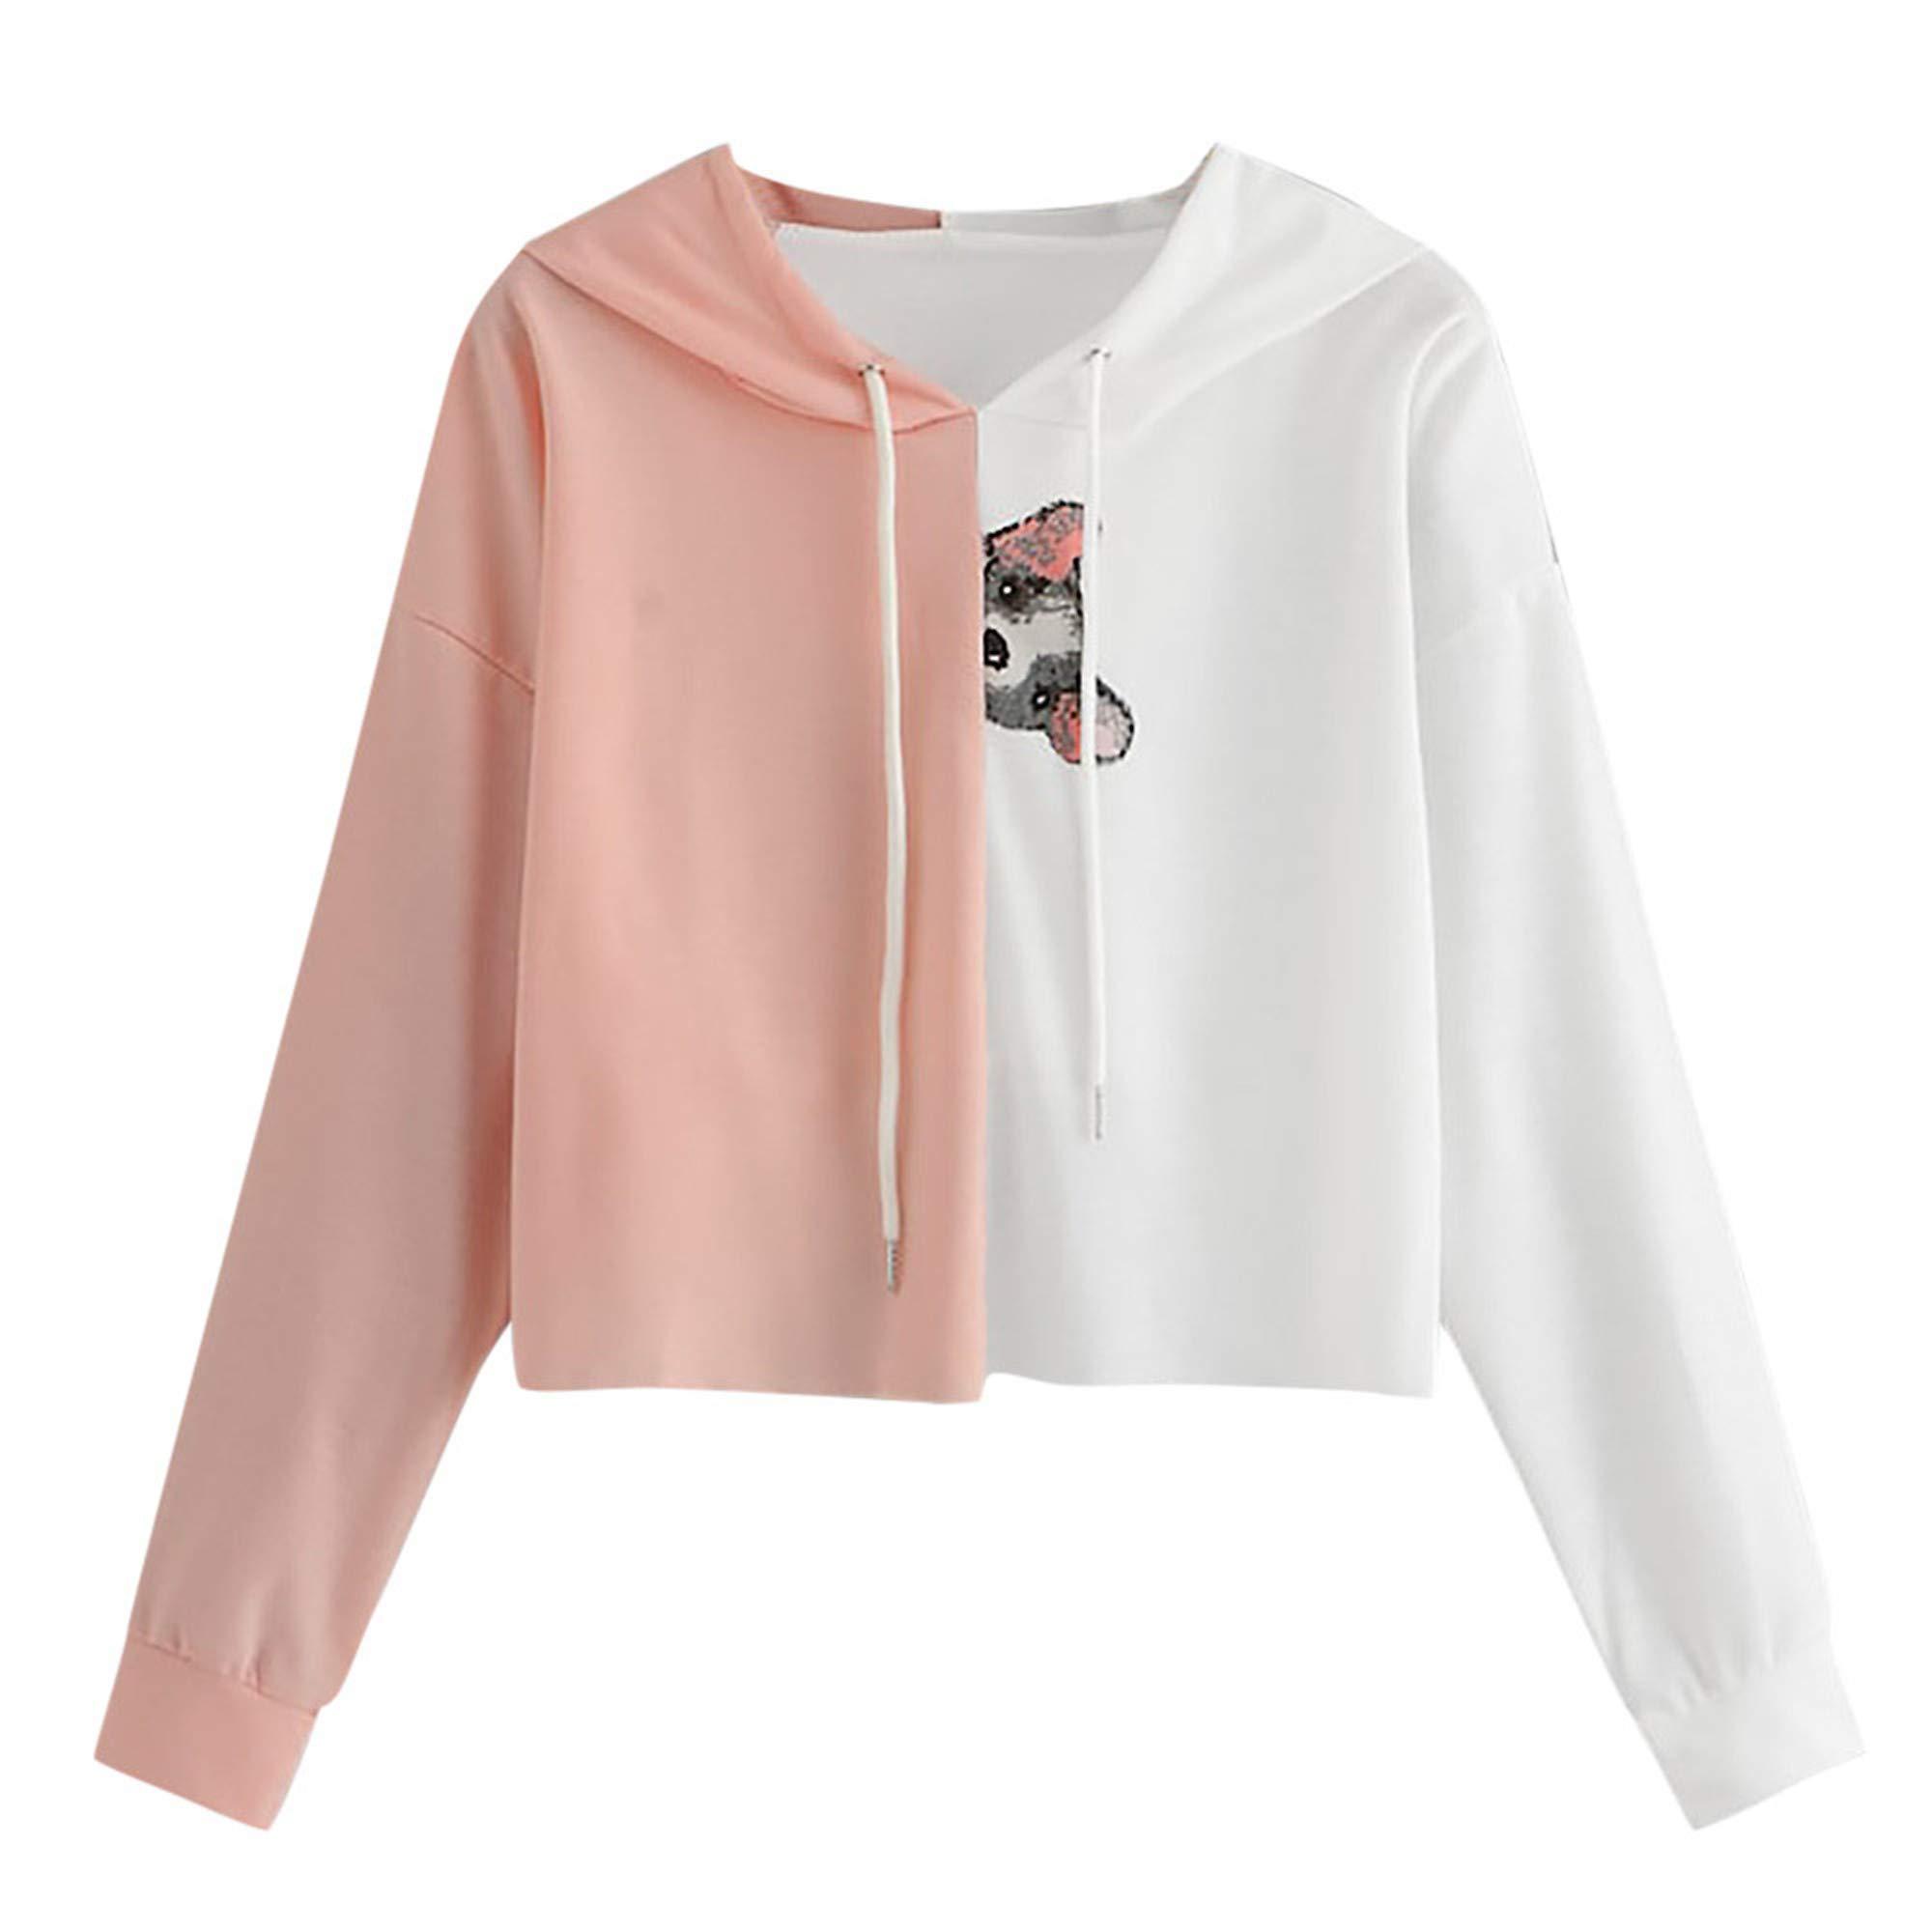 SMALLE ◕‿◕ Lovely in Women's Hoodies-Tops- Dog Printed Long Sleeve Short Drawstring Sweatshirt